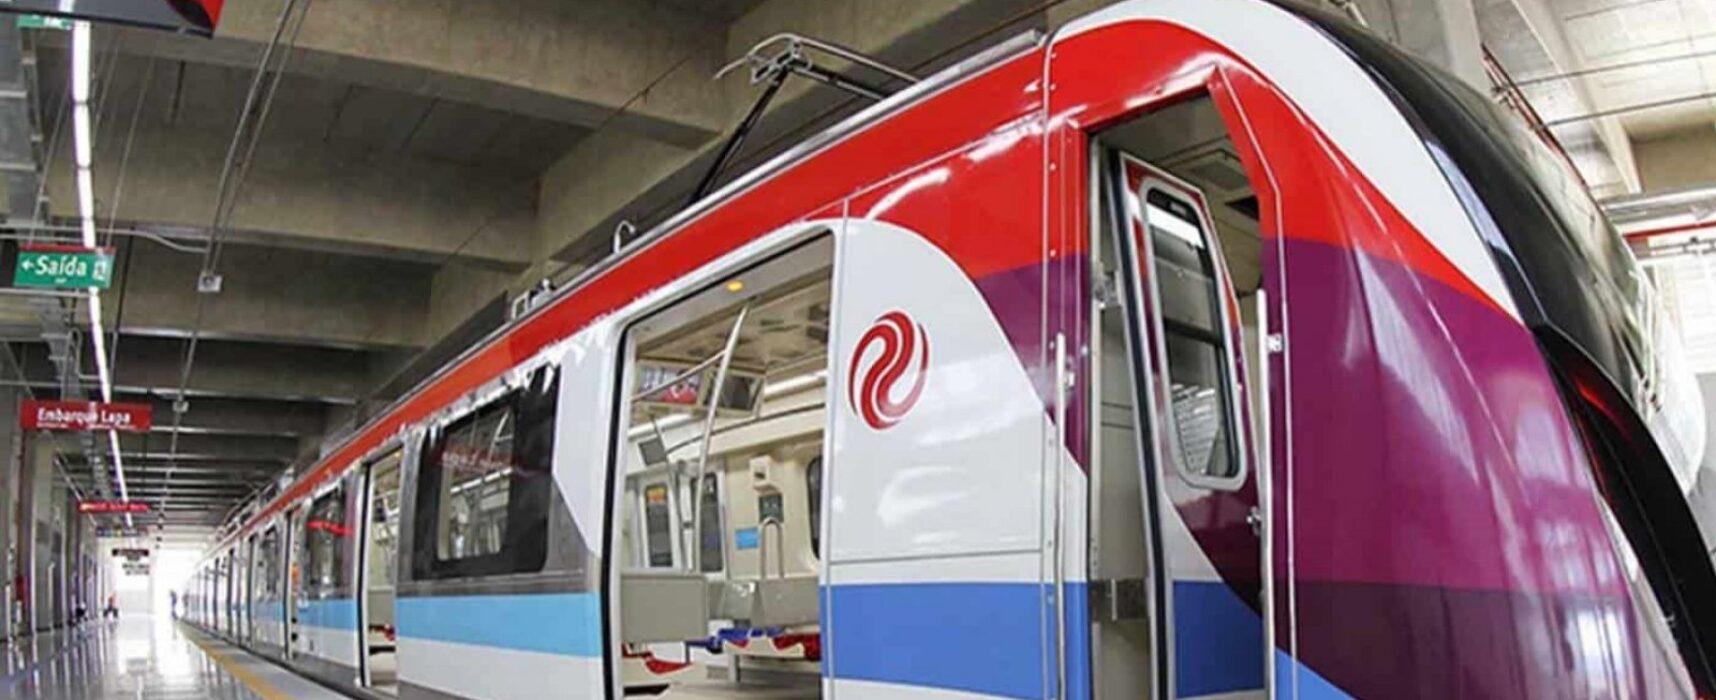 Tarifa do metrô será de R$ 4,10 a partir desta terça-feira